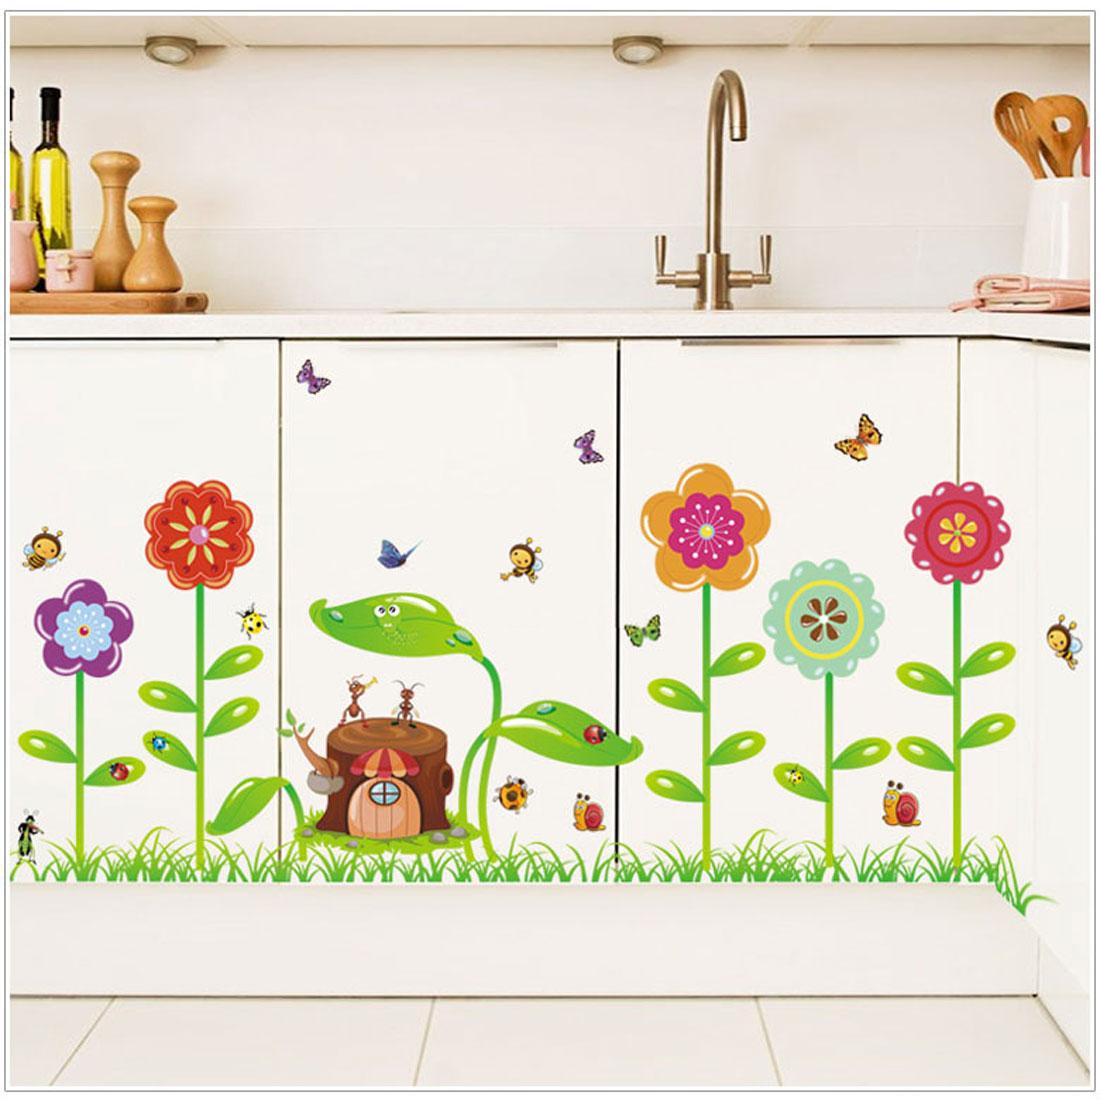 Flower Stump Print Water Resistant Adhesive Wall Sticker Decal Mural 70 x 50cm - image 1 de 5